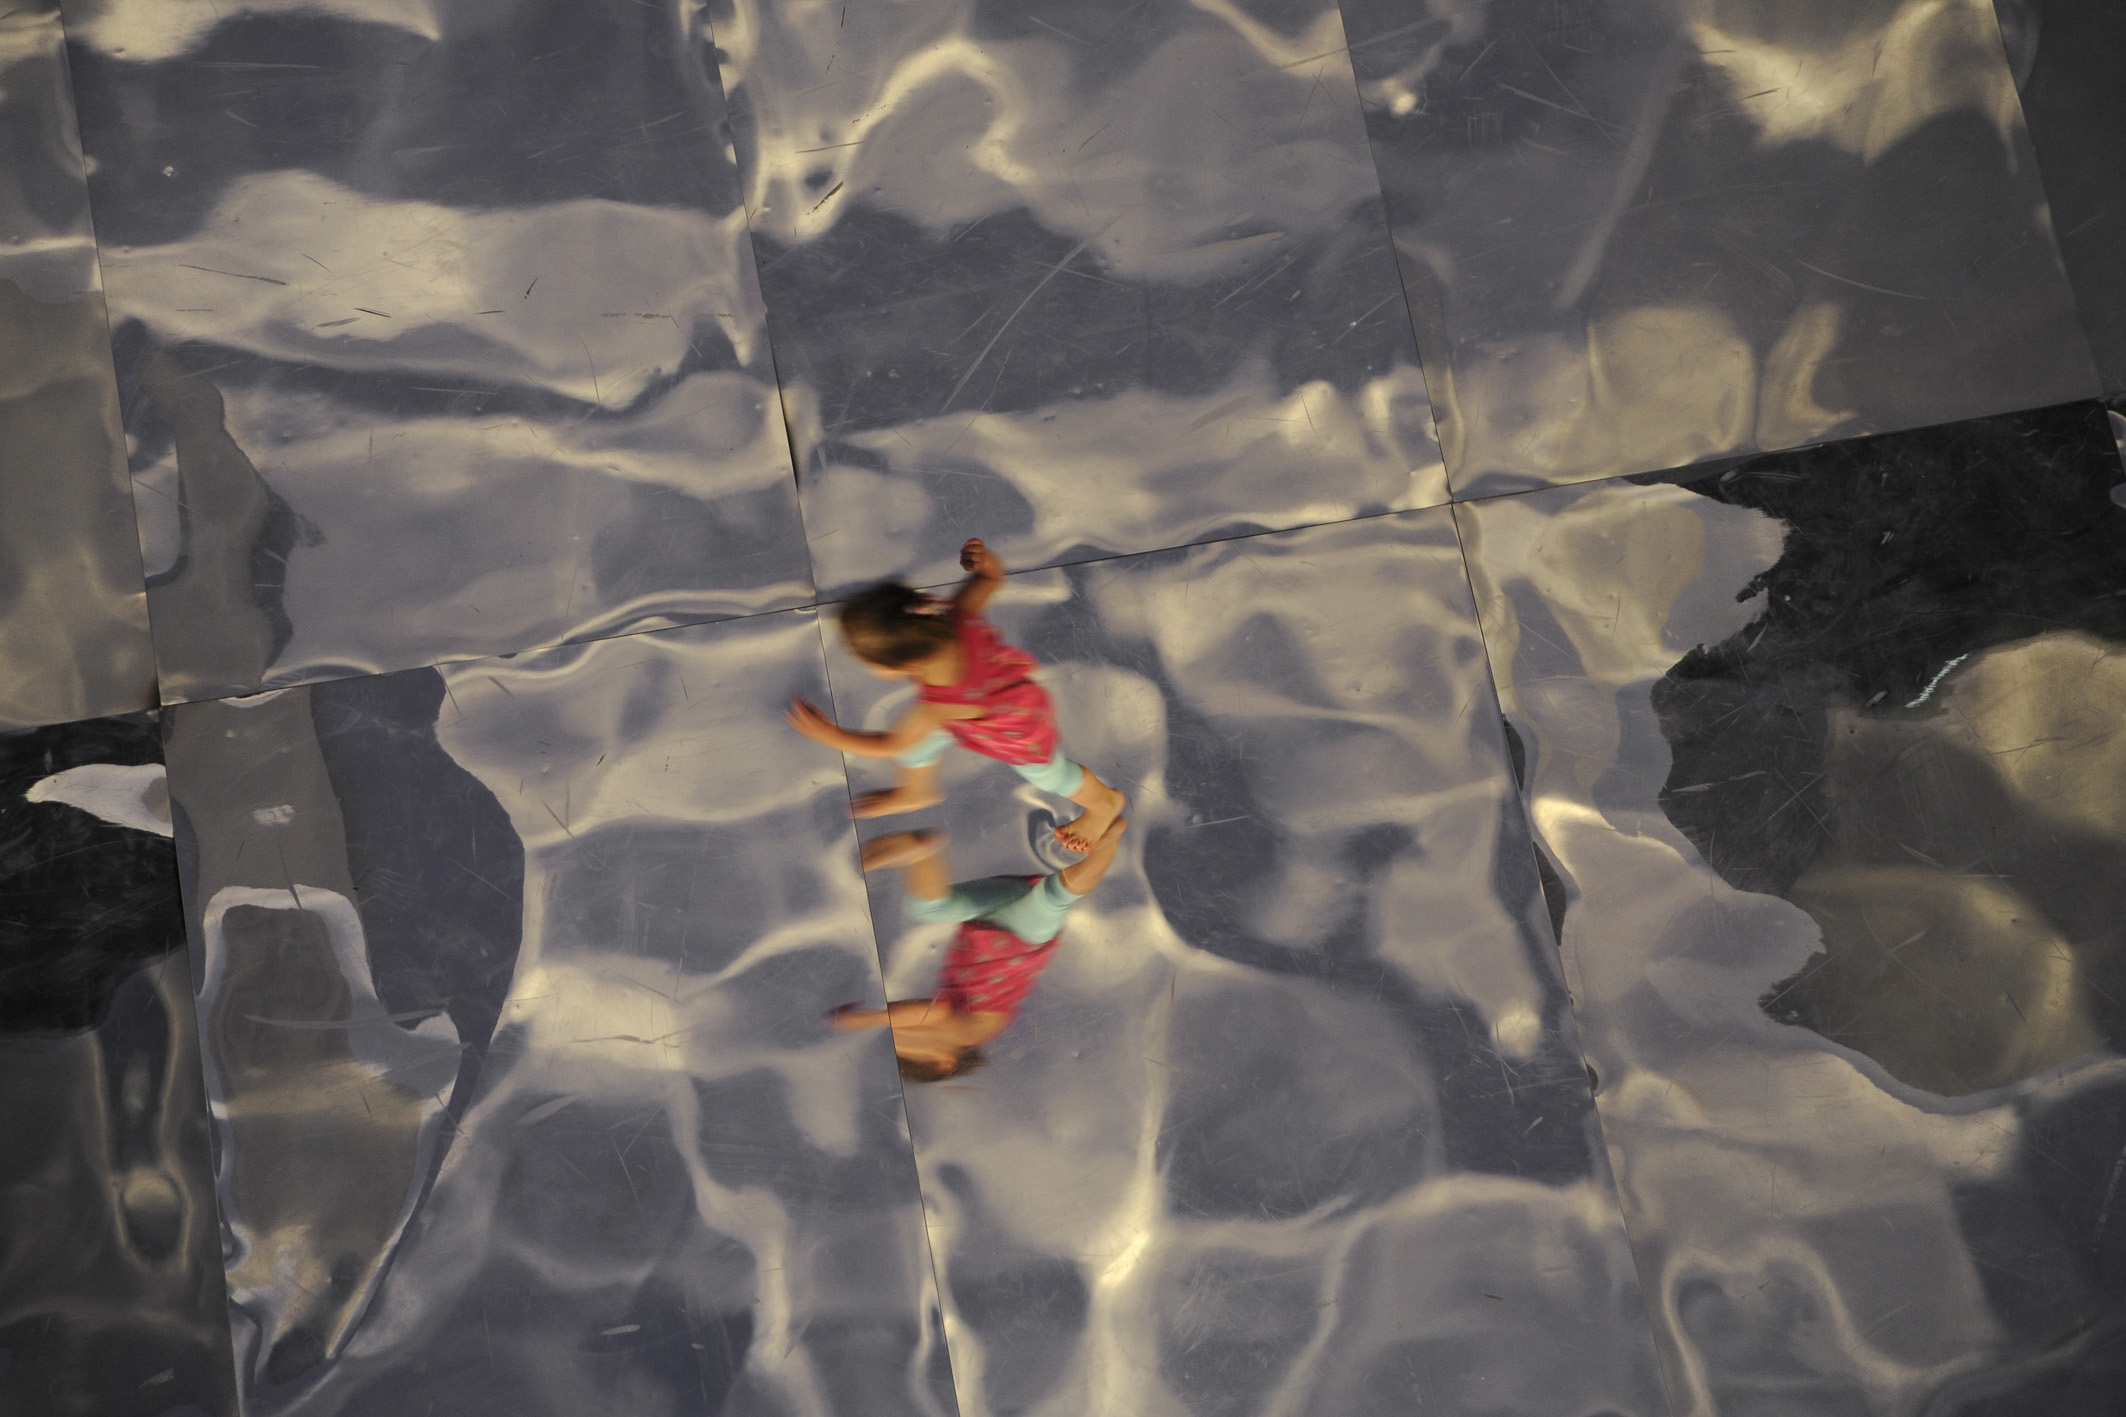 water | água    @ oca pq. ibirapuera 2010   + expo